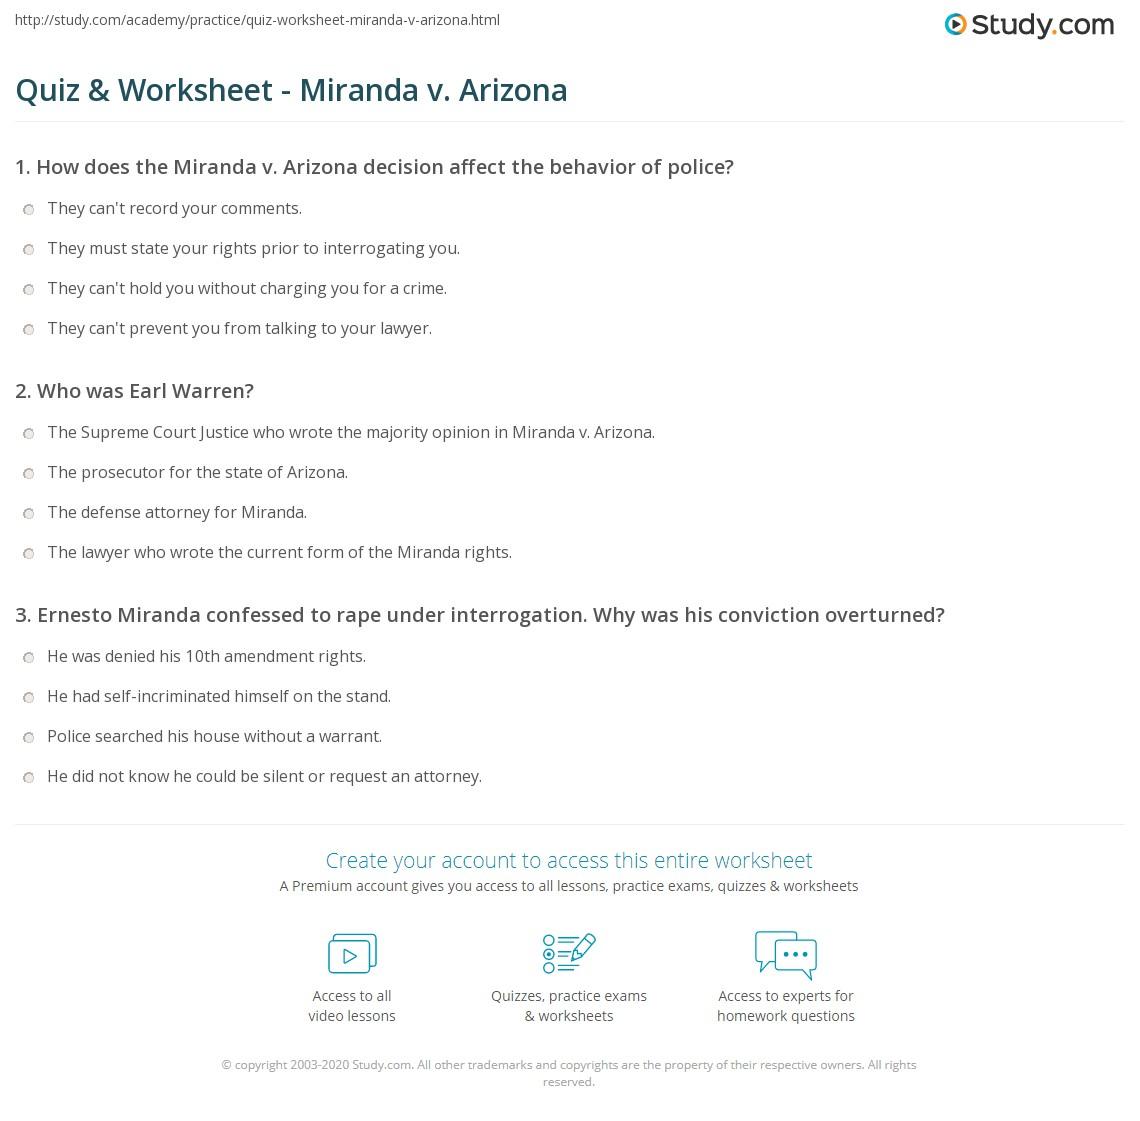 photograph relating to Miranda Warning Card Printable named Quiz Worksheet - Miranda v. Arizona